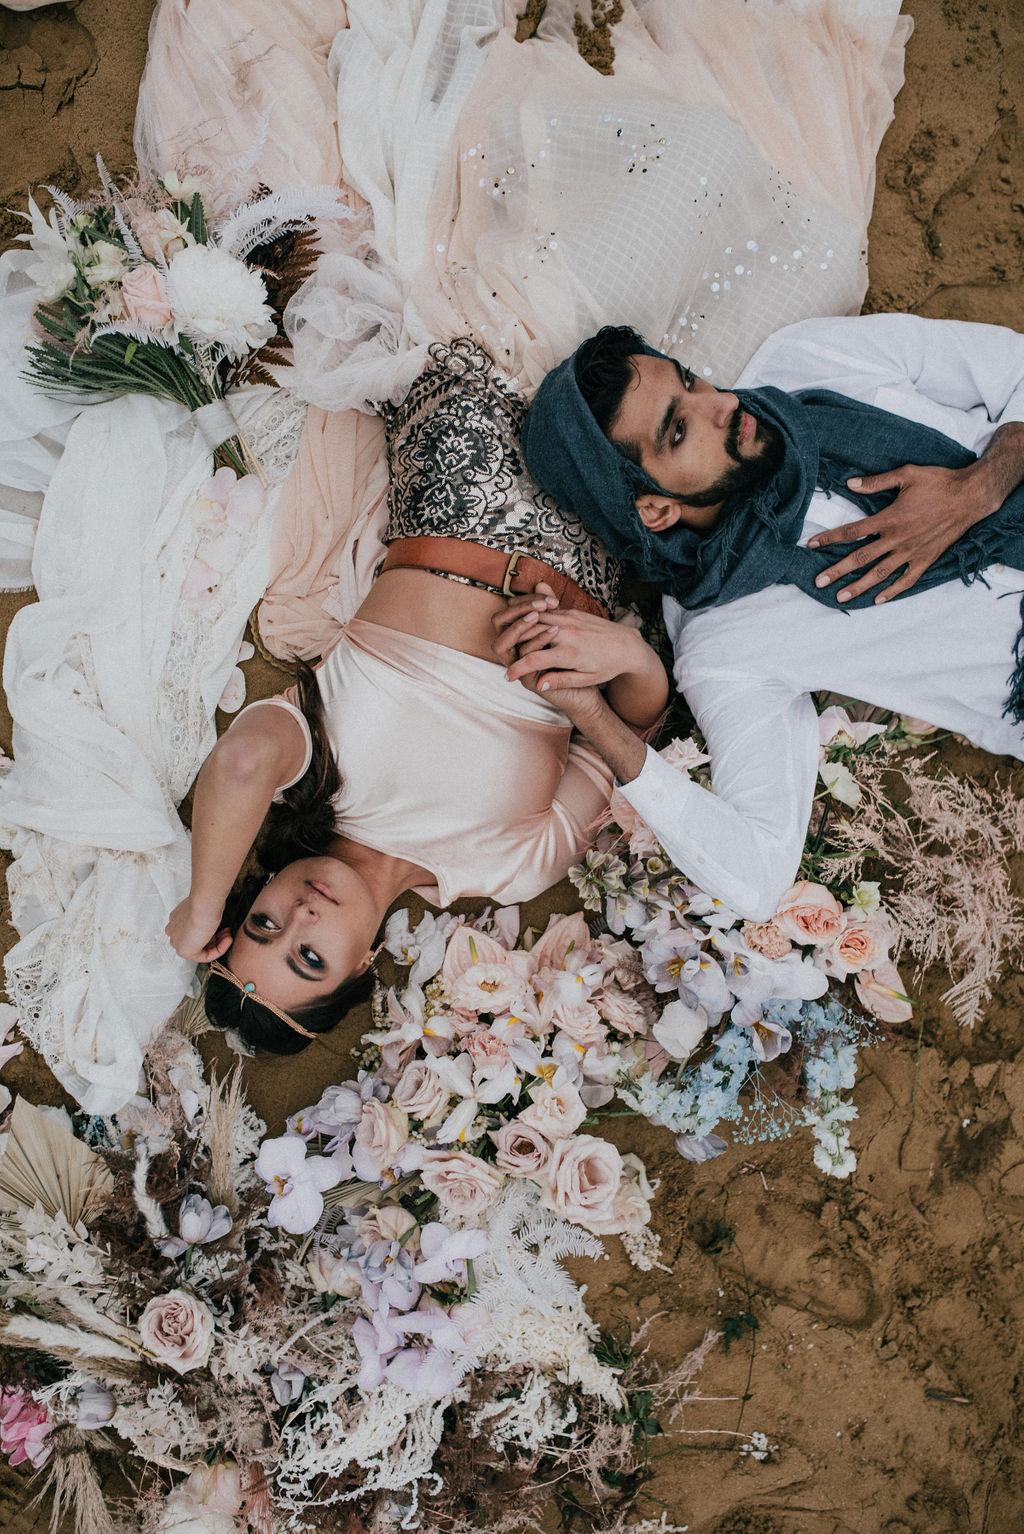 CodyJamesBarryPhotography_Aladdin-195.jpg